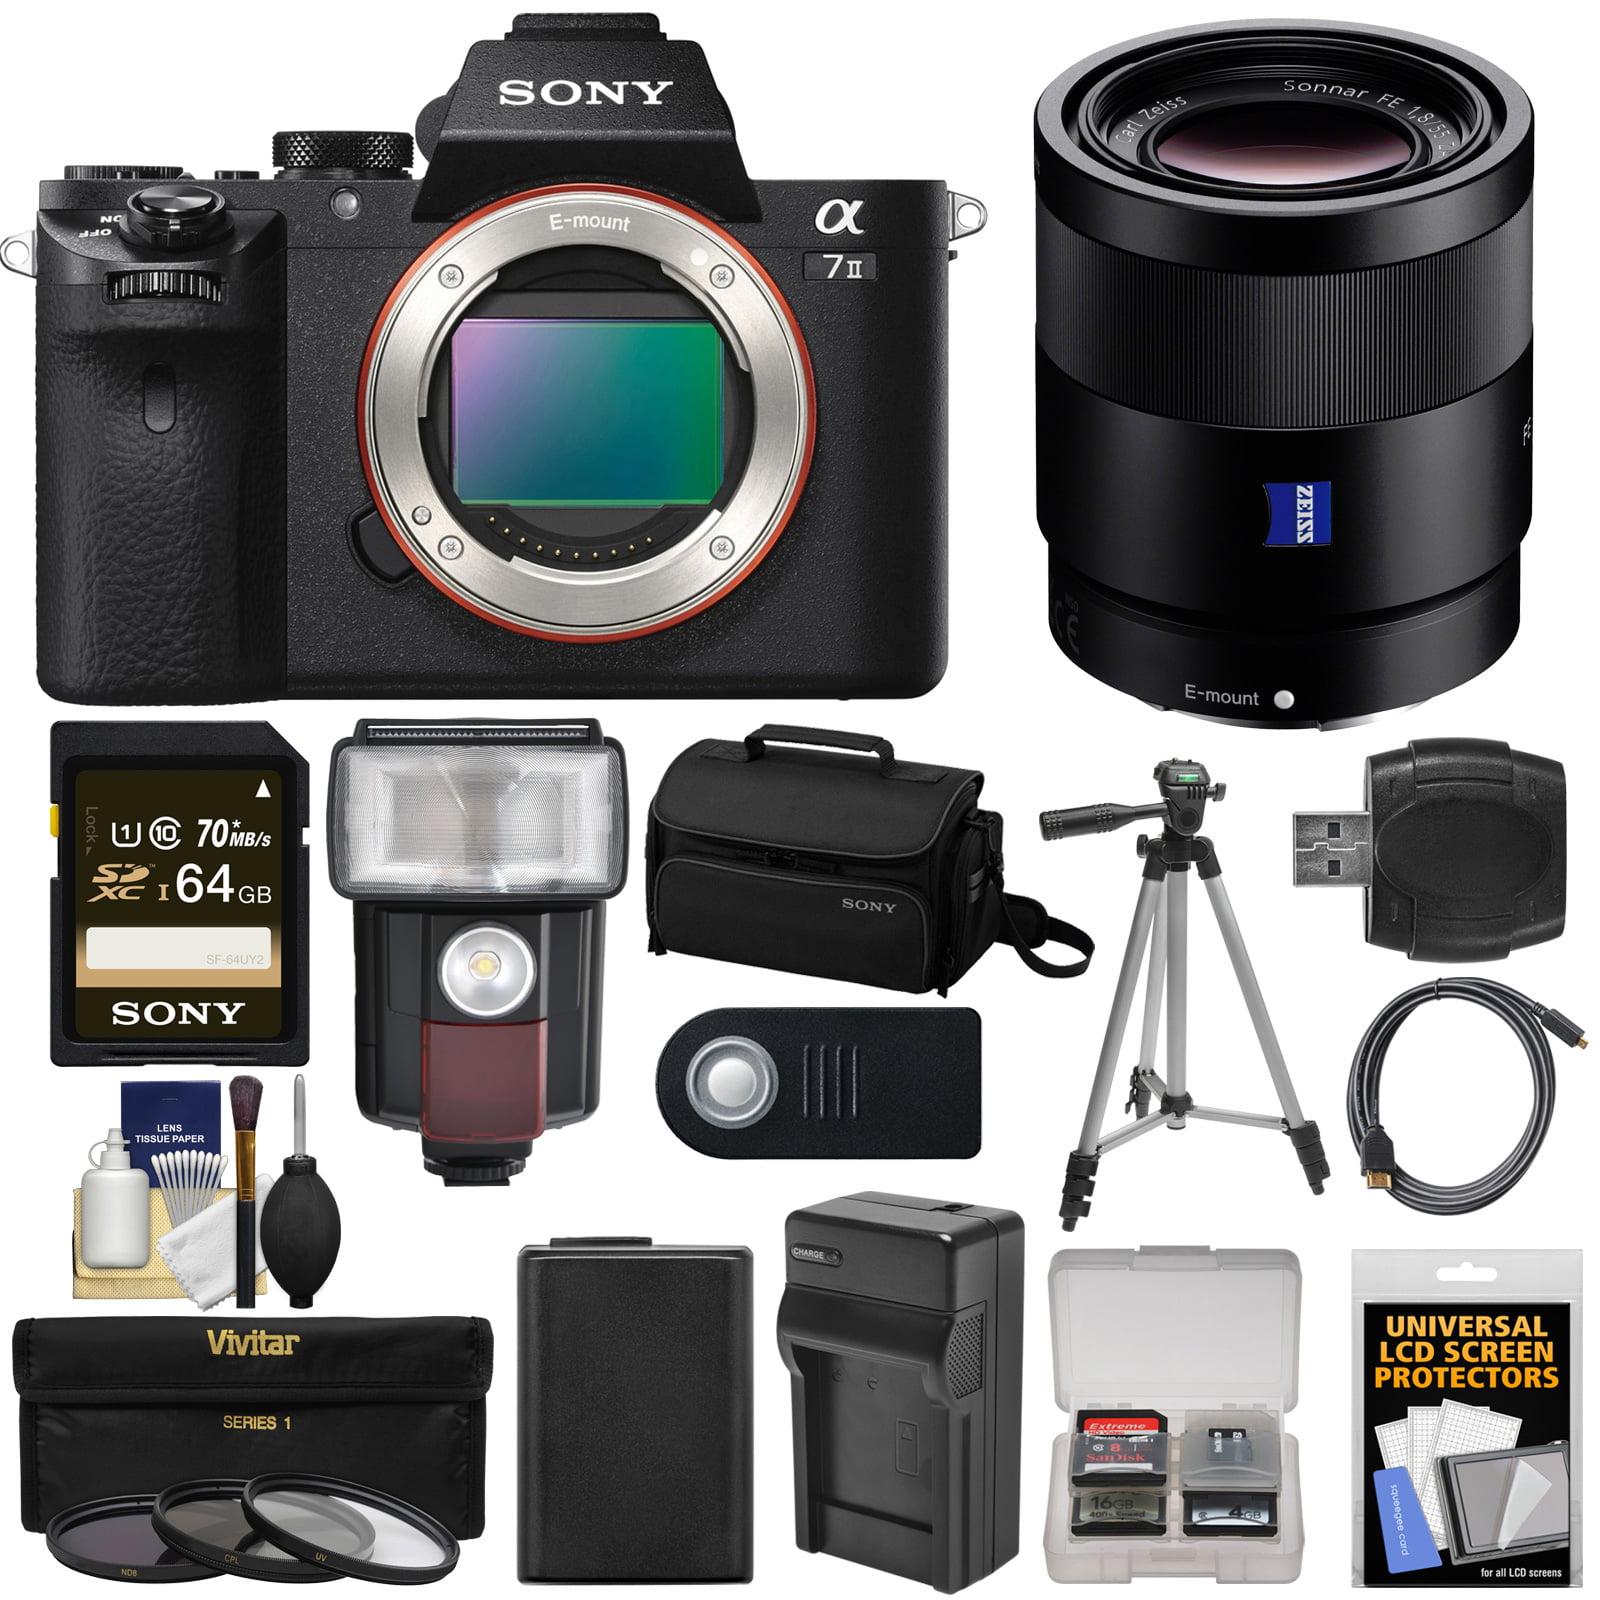 Sony Alpha A7 II Digital Camera Body with Vario-Tessar T* FE 24-70mm f 4 ZA OSS Zoom Lens + 64GB Card +... by Sony